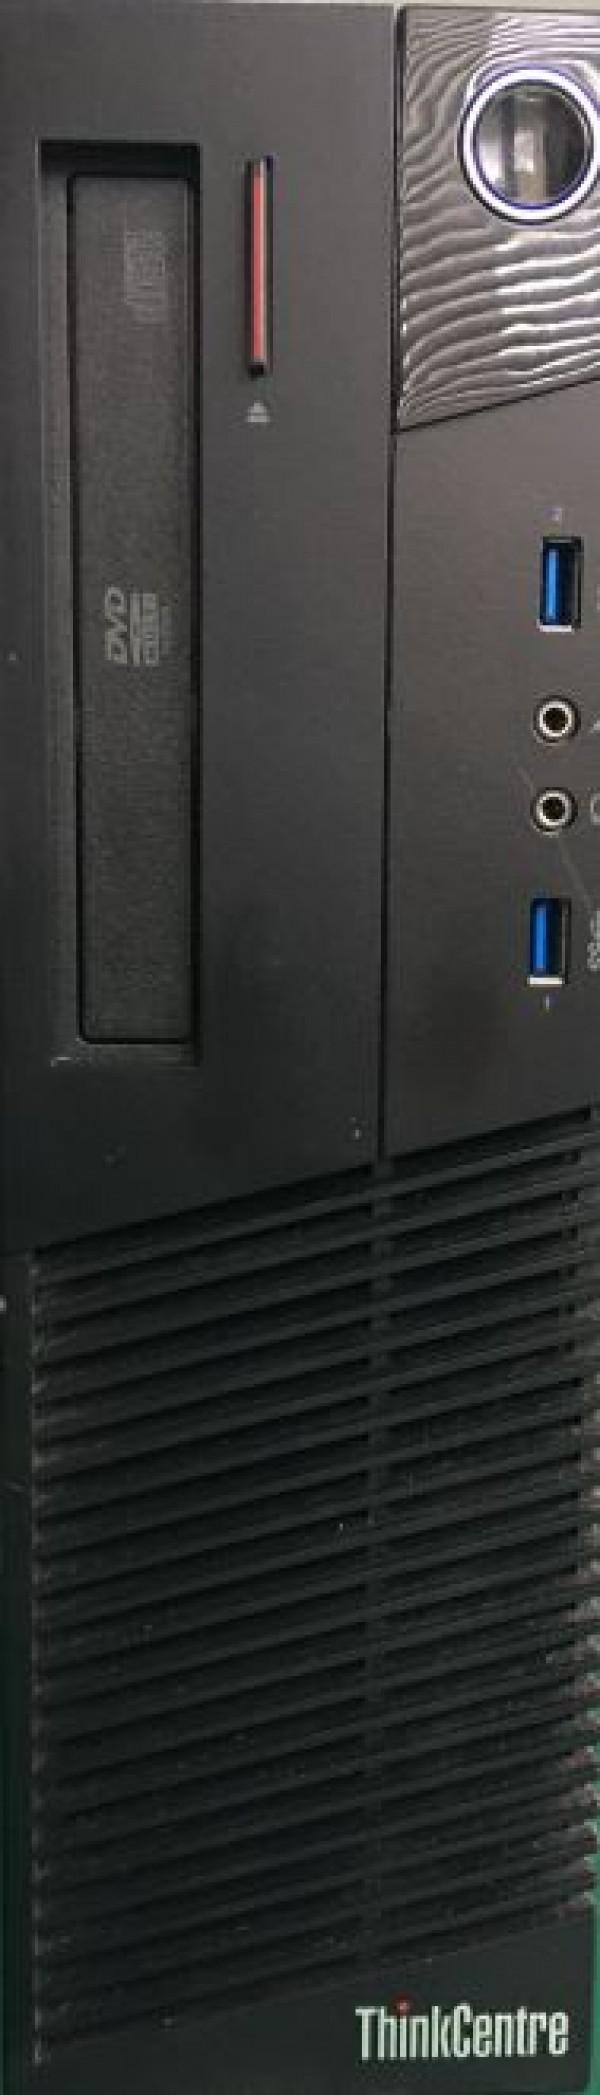 Lenovo M93p SFF 10A8 i3-4170/8GB/120GB-SSD/DVD/Win10Pro Refurbished